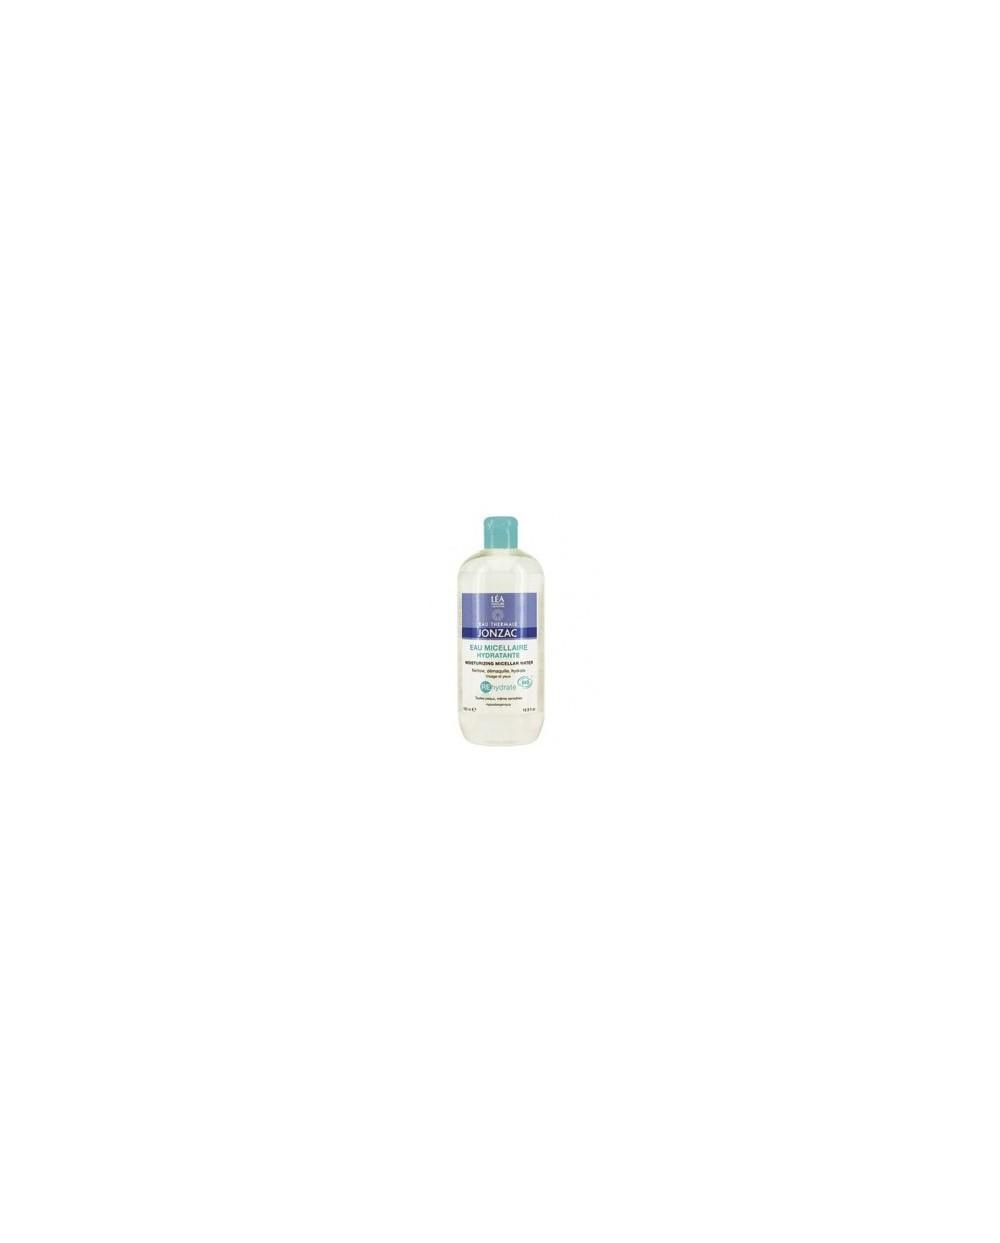 Eau Thermale Jonzac - REHIDRATE - Acqua micellare idratante